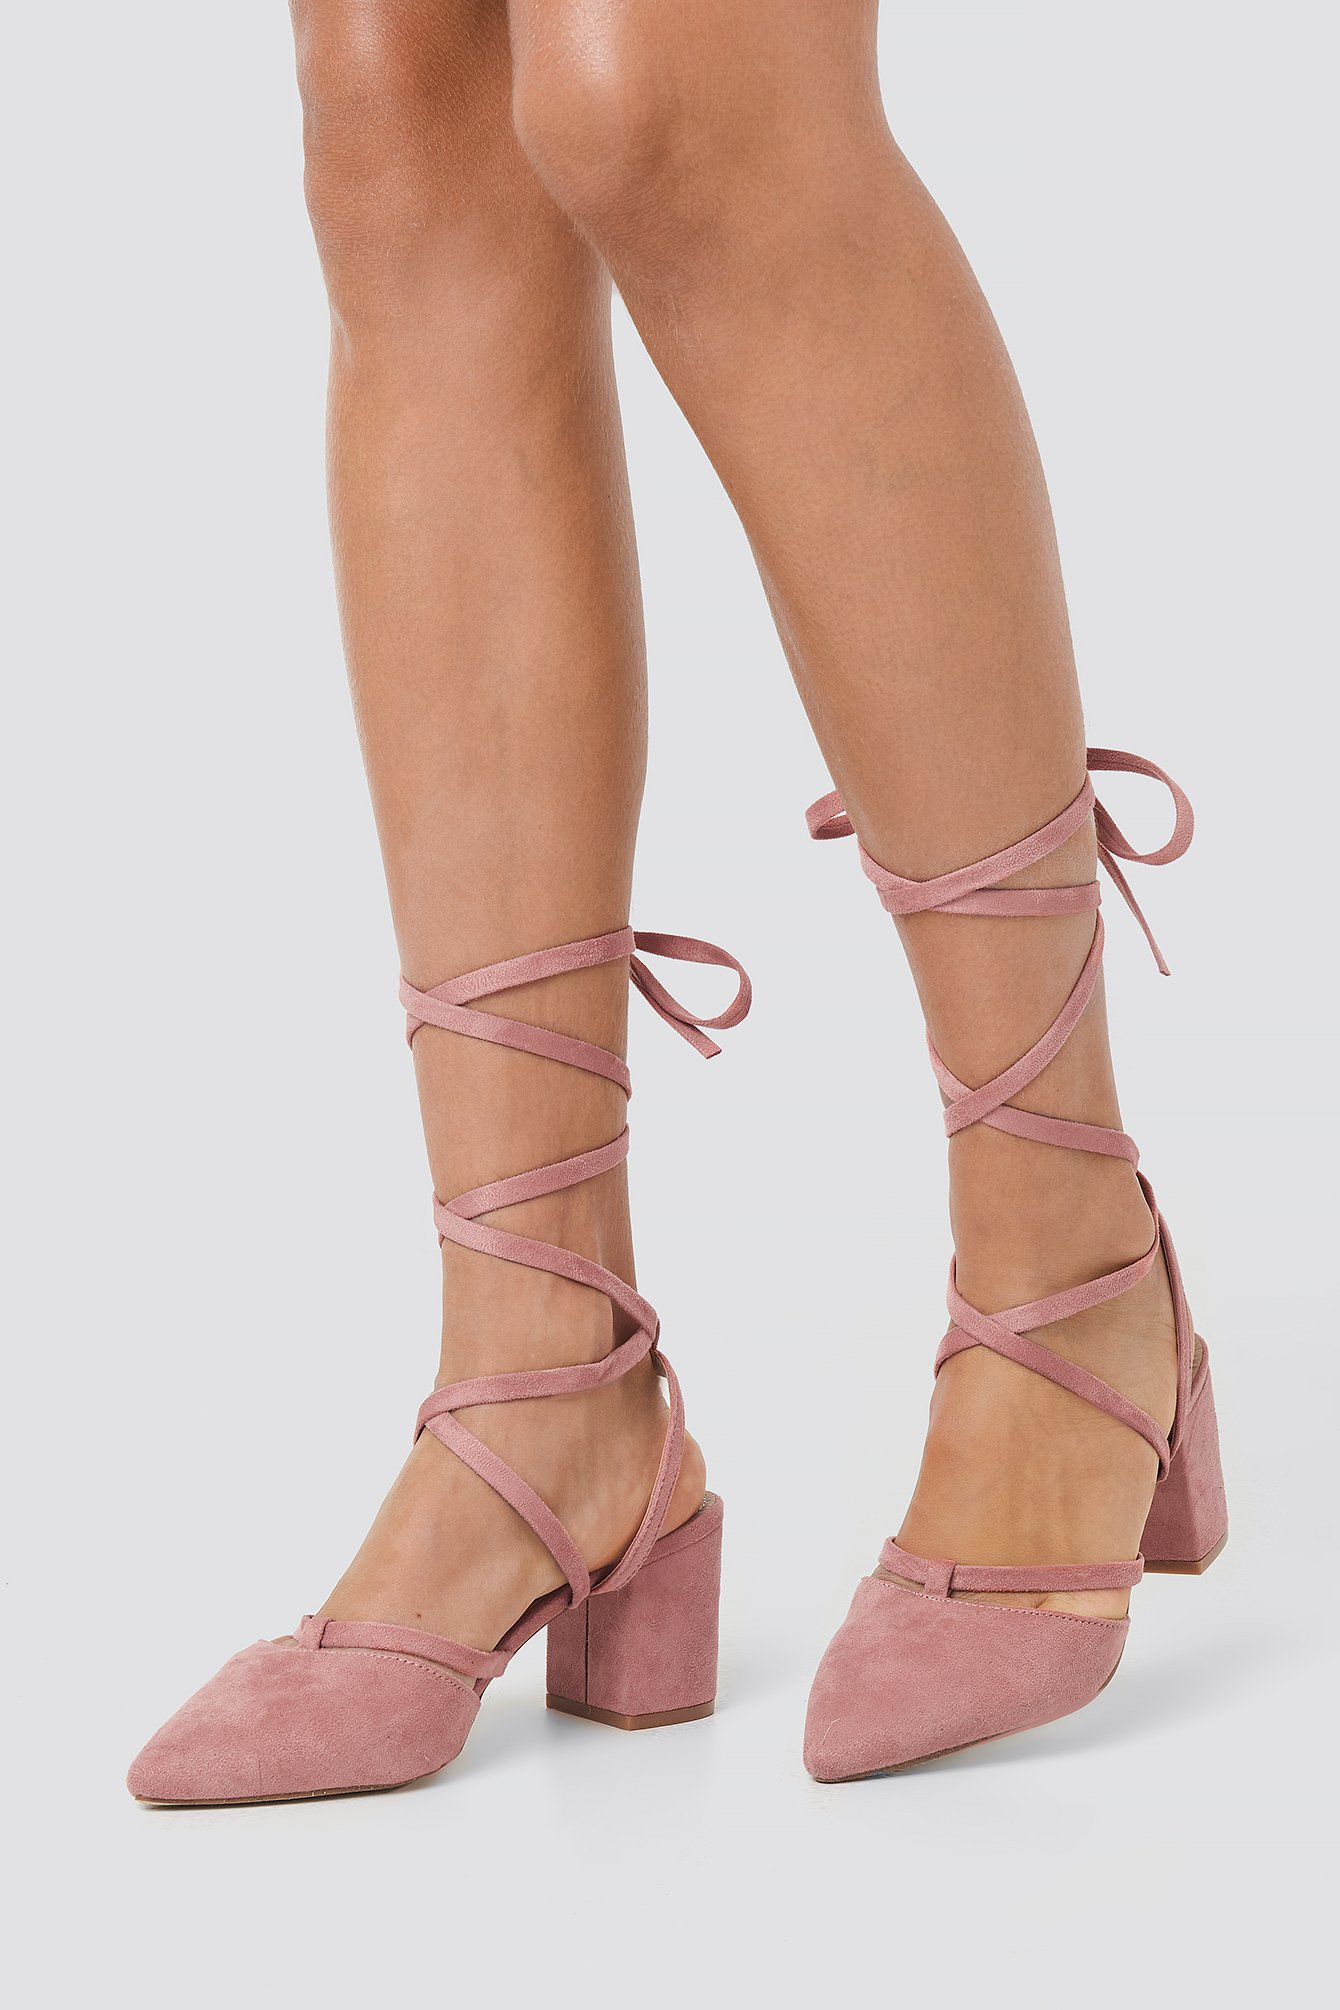 raid -  Elyza Court Shoe Heel - Pink